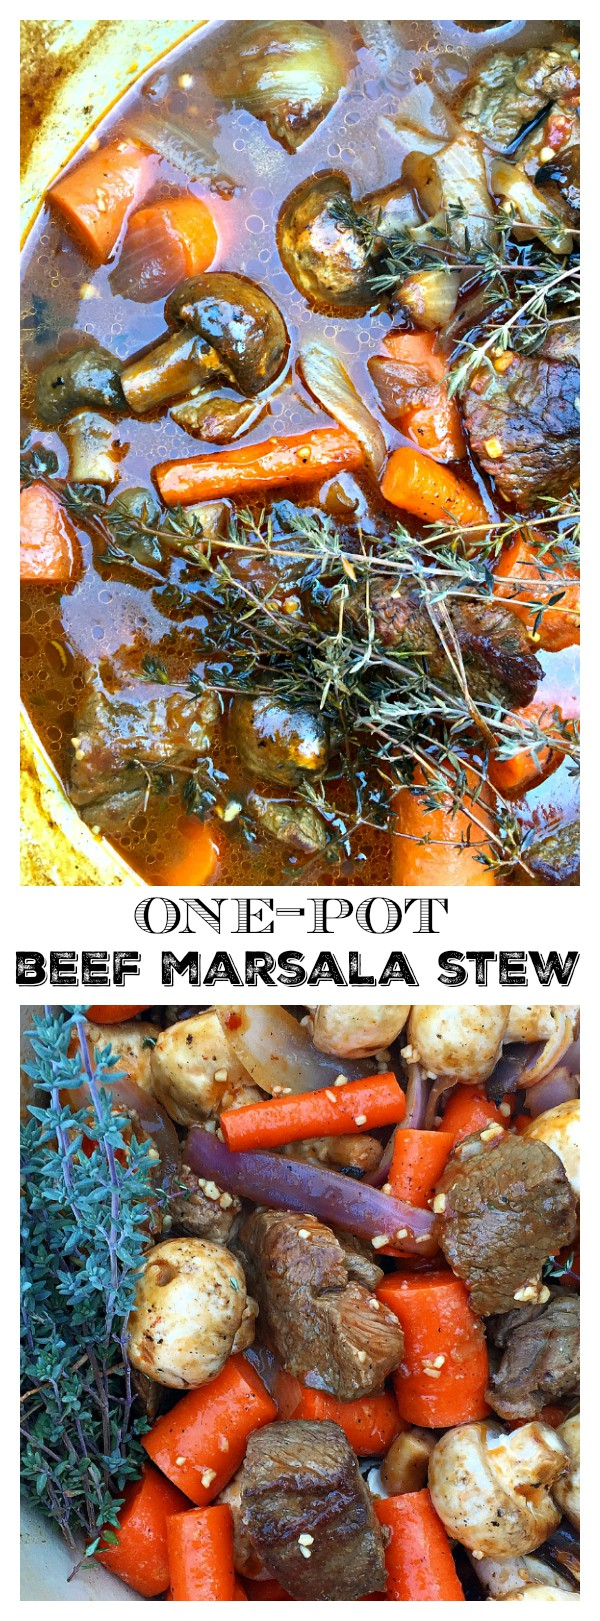 One-Pot Beef Marsala Stew